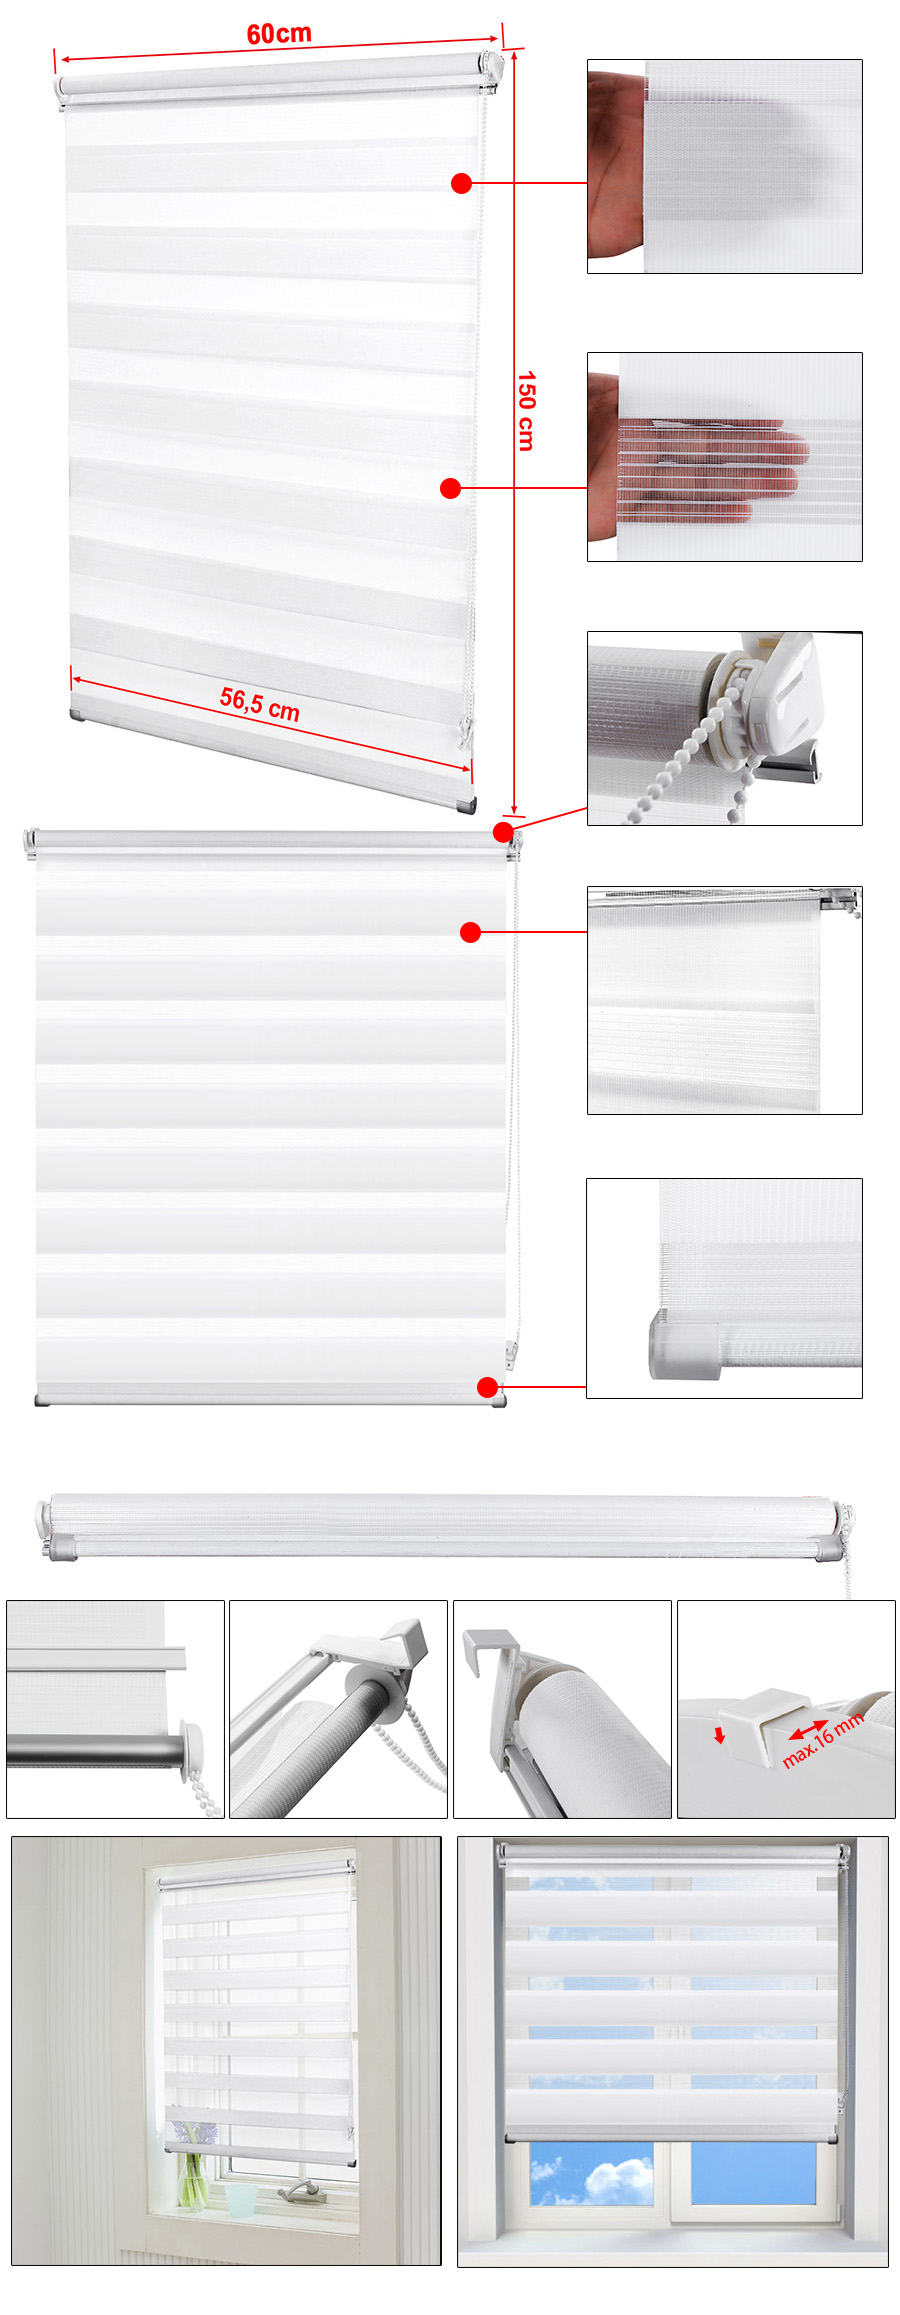 songmics 60 x 150 cm doppelrollo duo rollo klemmfix kettenzugrollo lsg60w ebay. Black Bedroom Furniture Sets. Home Design Ideas